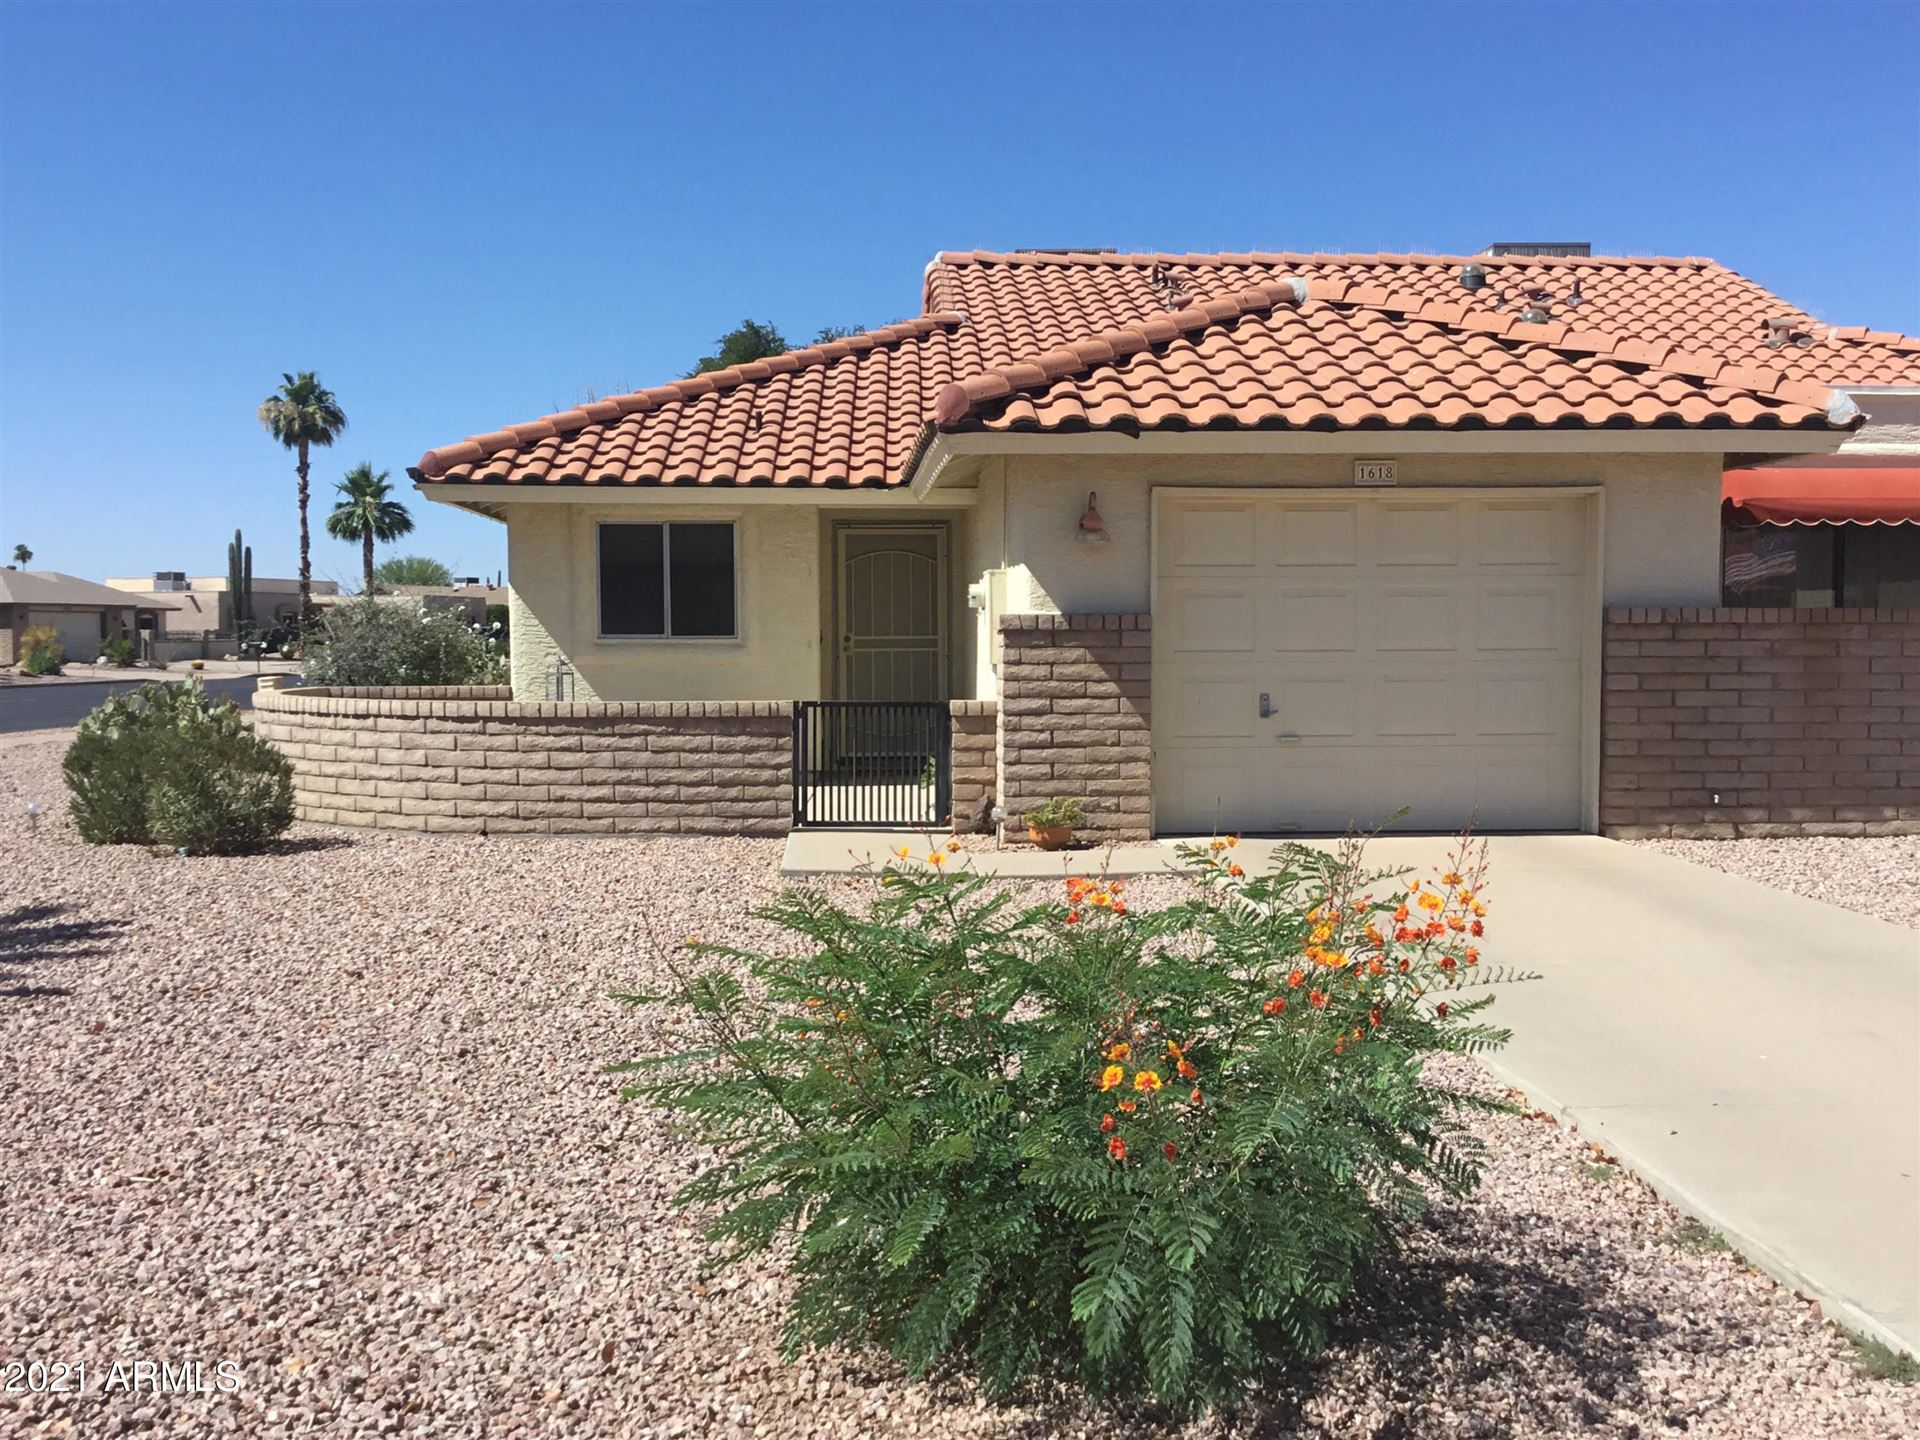 Photo of 1618 LEISURE WORLD --, Mesa, AZ 85206 (MLS # 6249709)